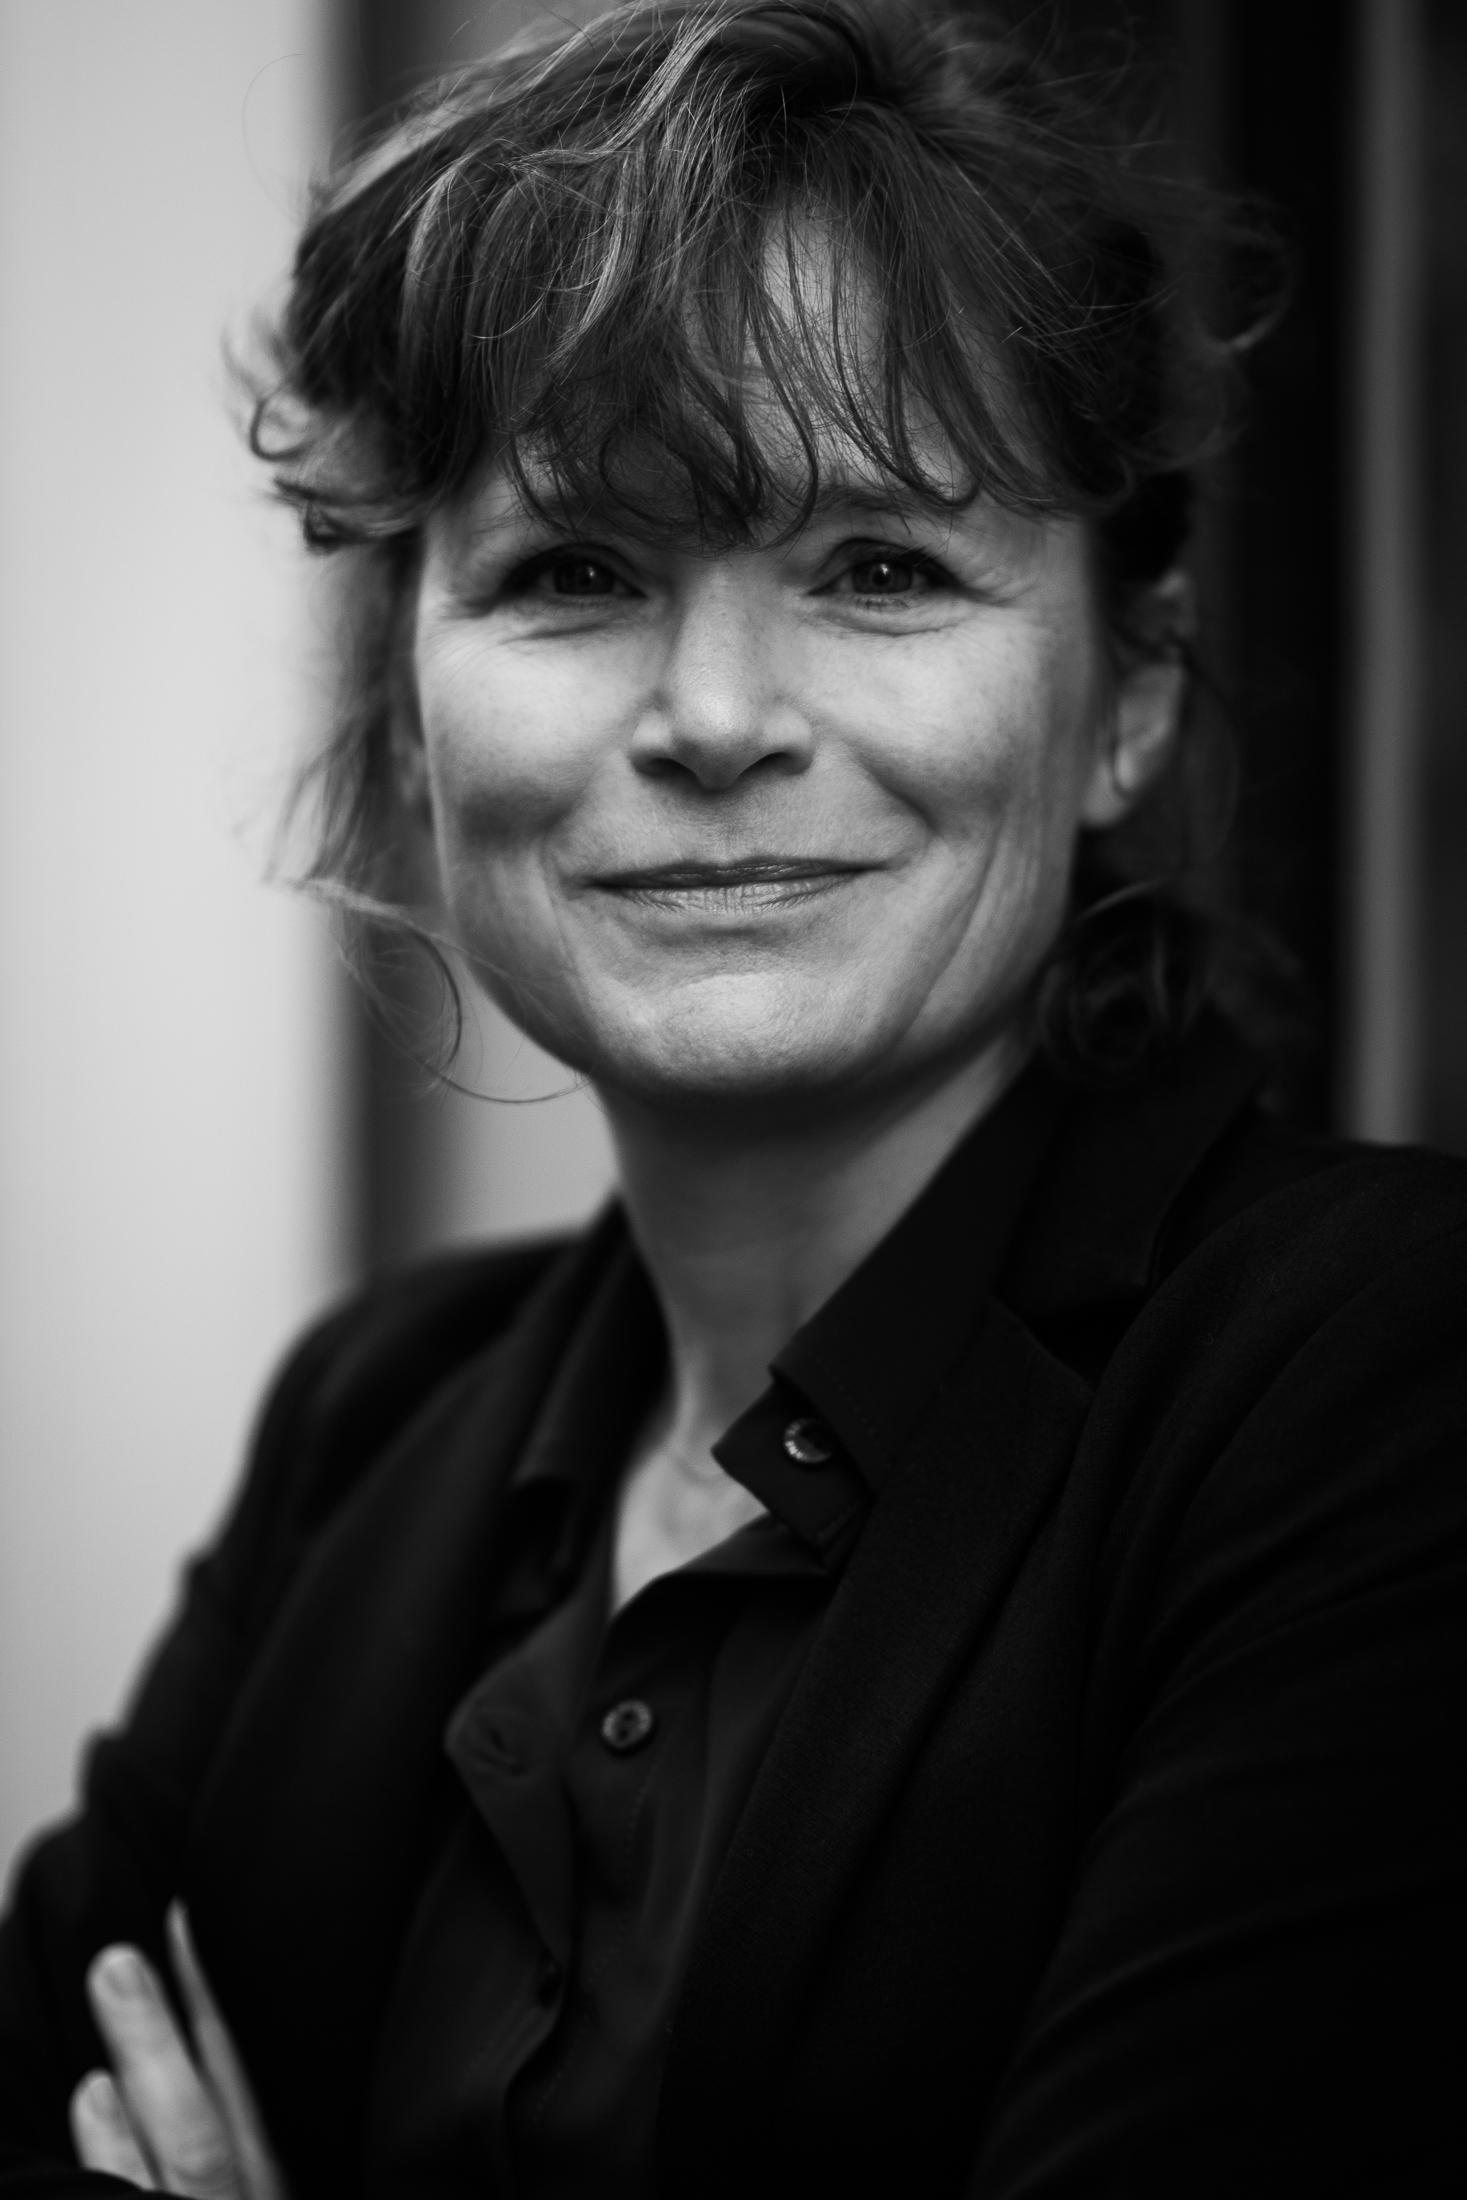 Annemieke van der Laan